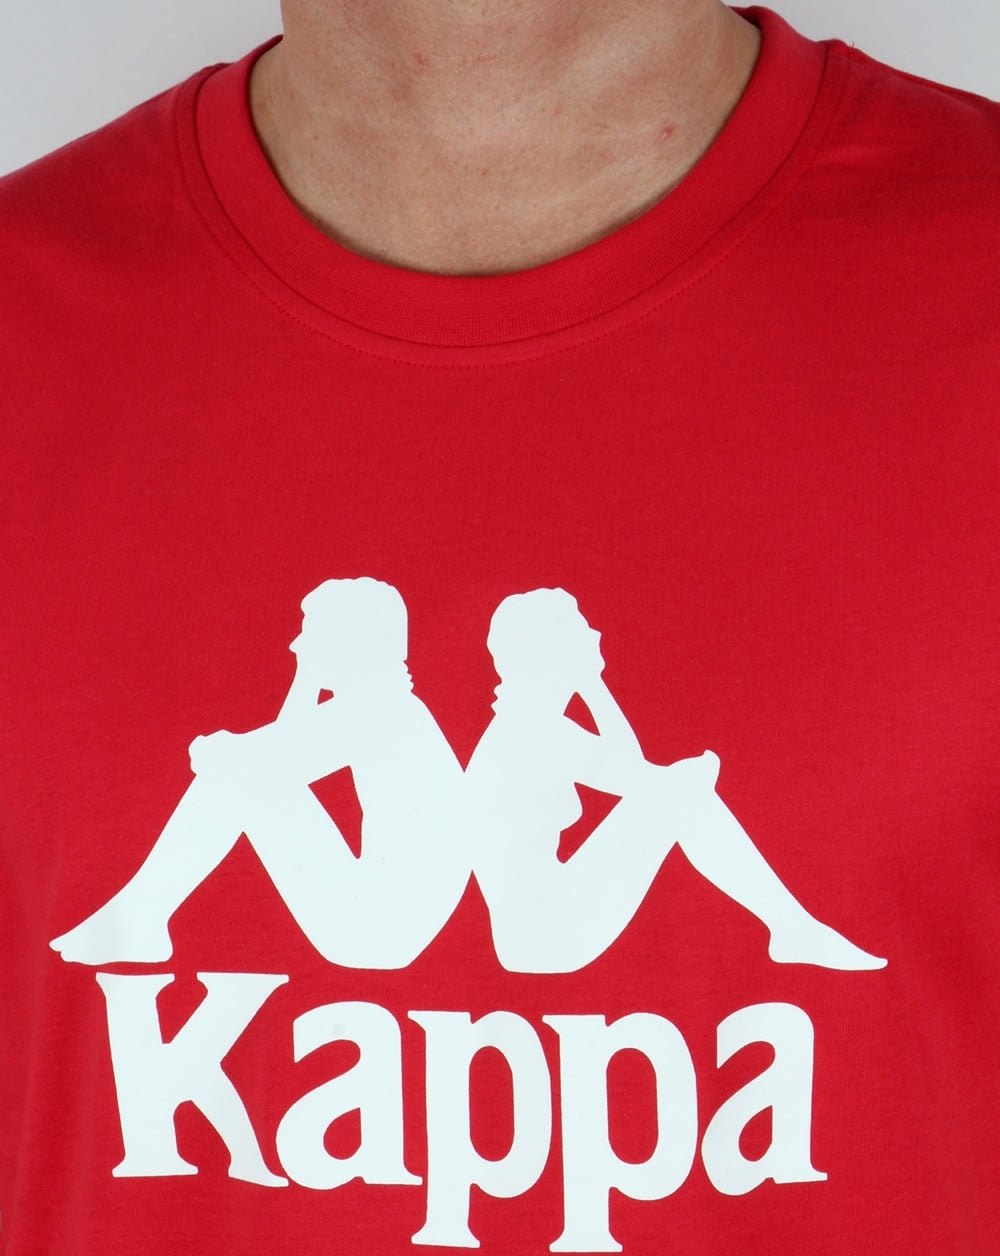 Robe Di Kappa Whaddon T Shirt Red Tee Logo Mens